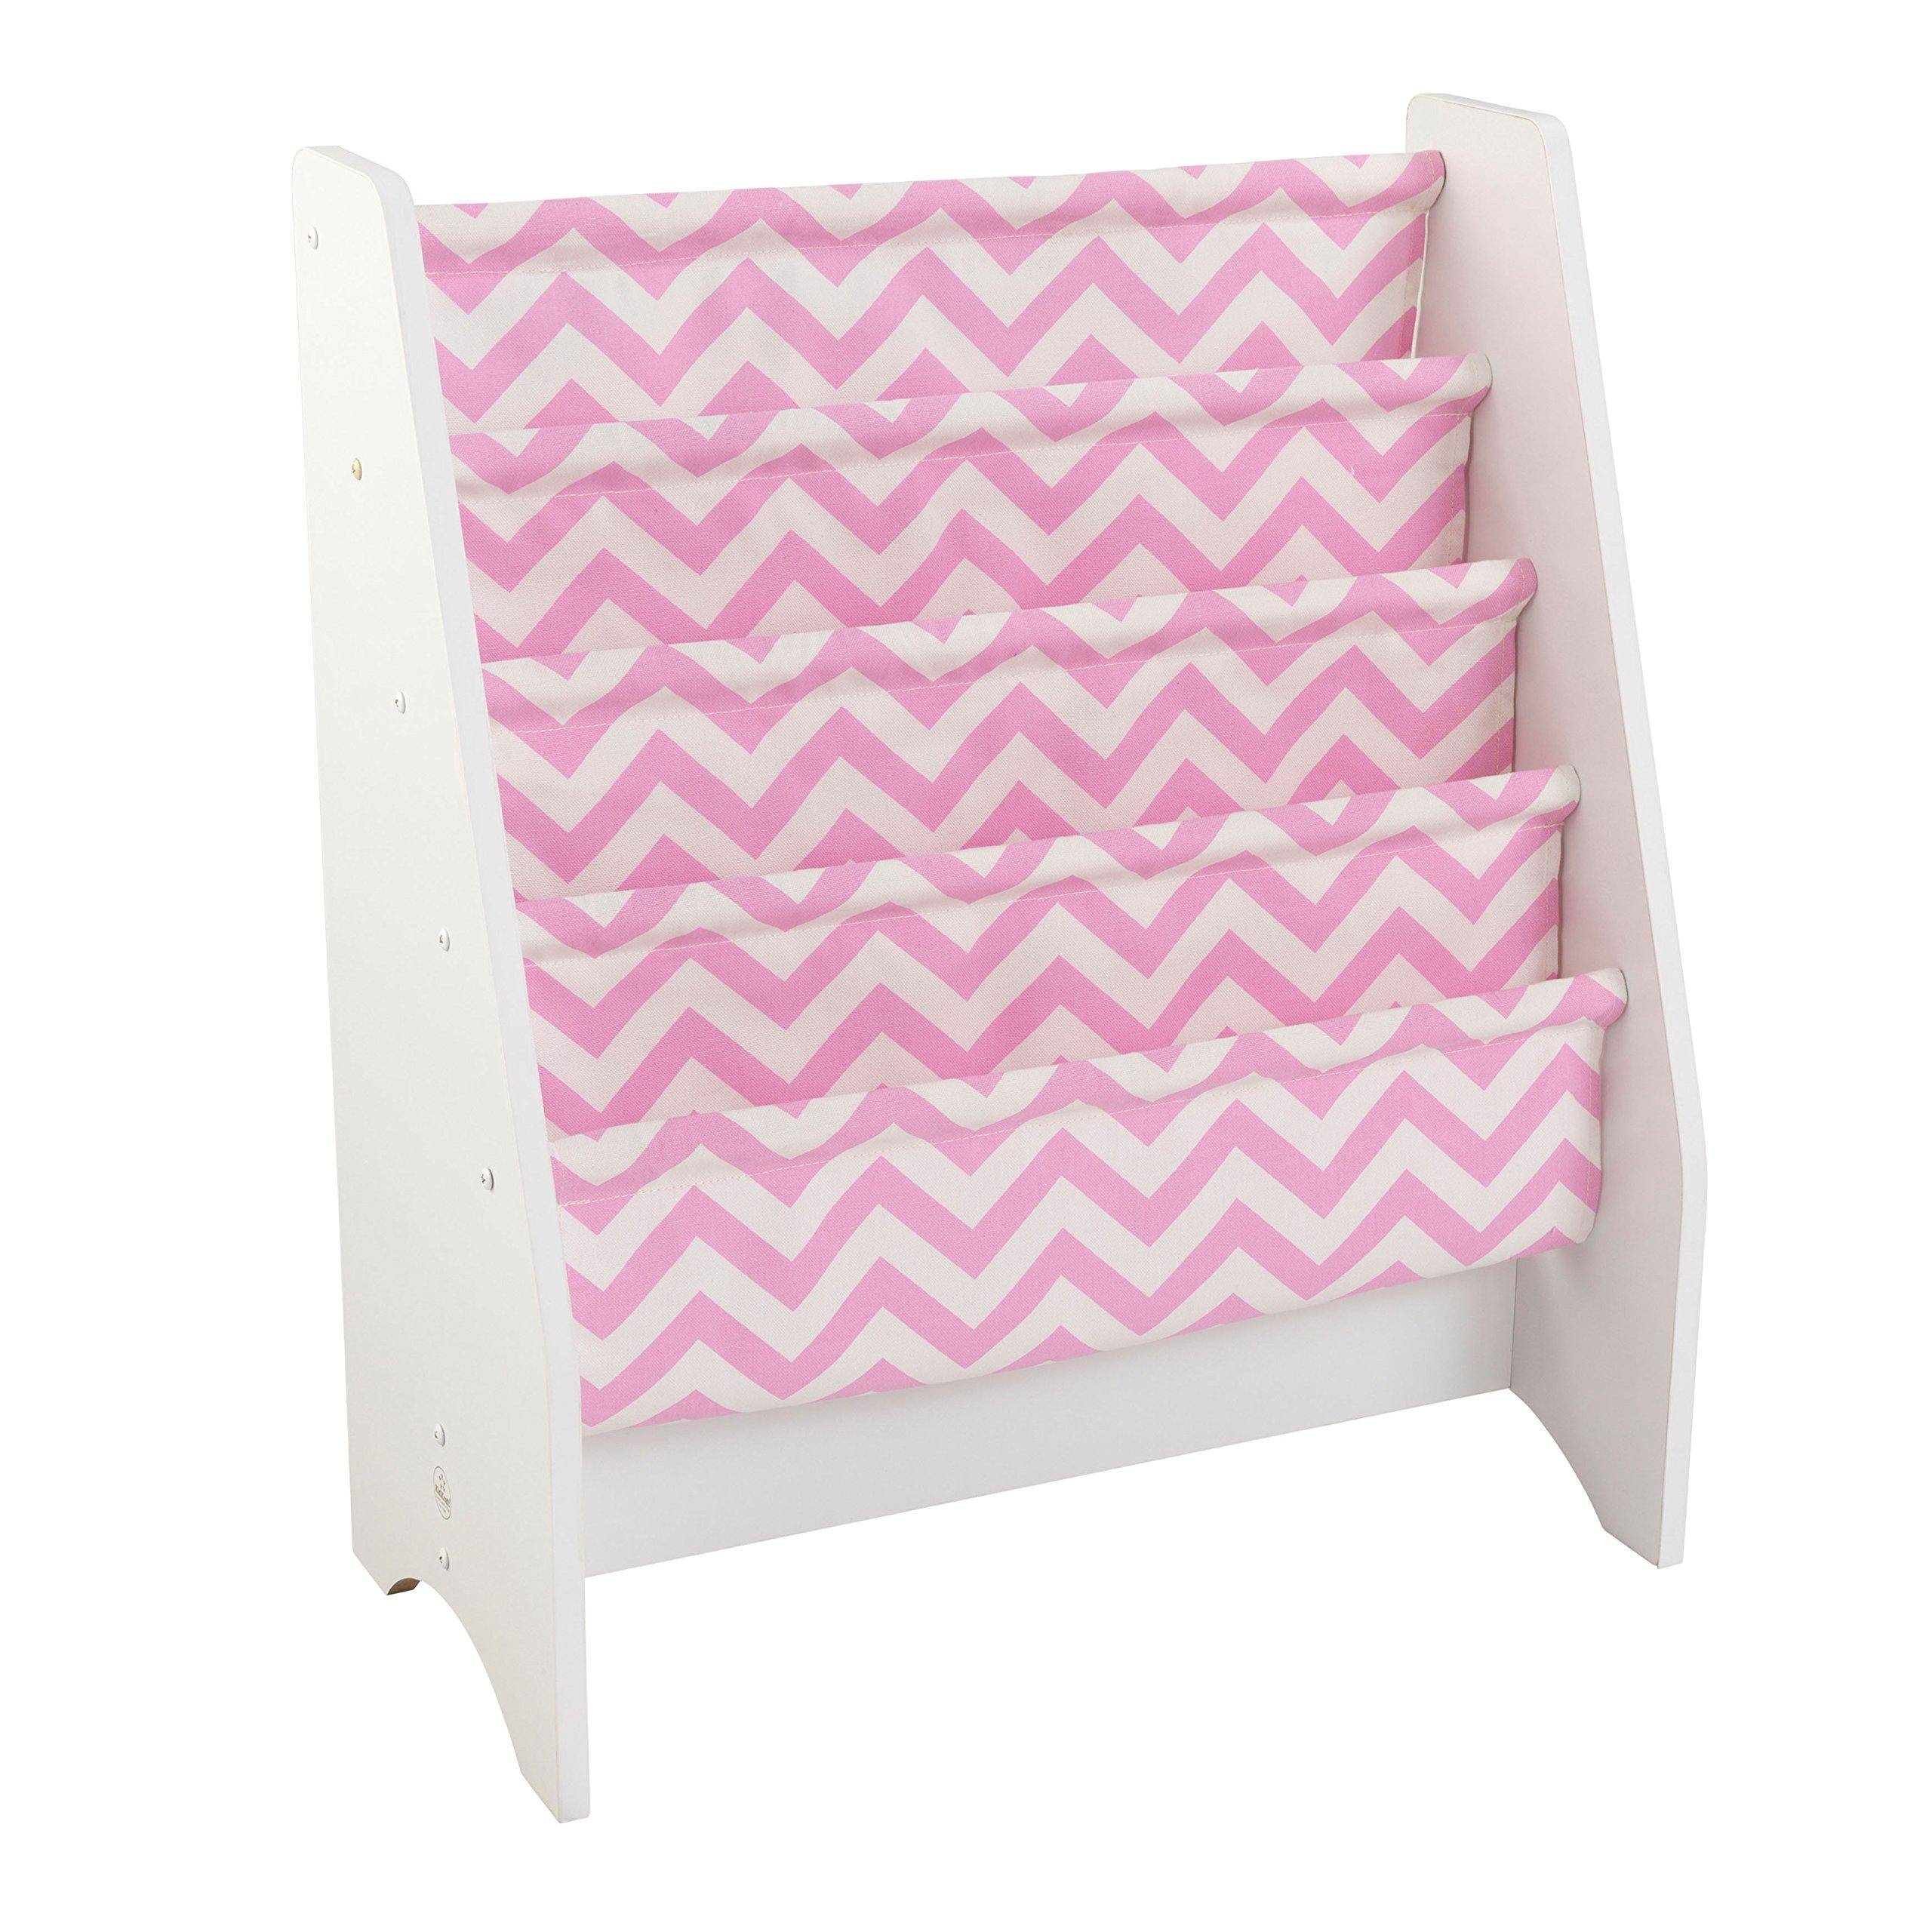 KidKraft Bookcase, Pink by KidKraft (Image #2)